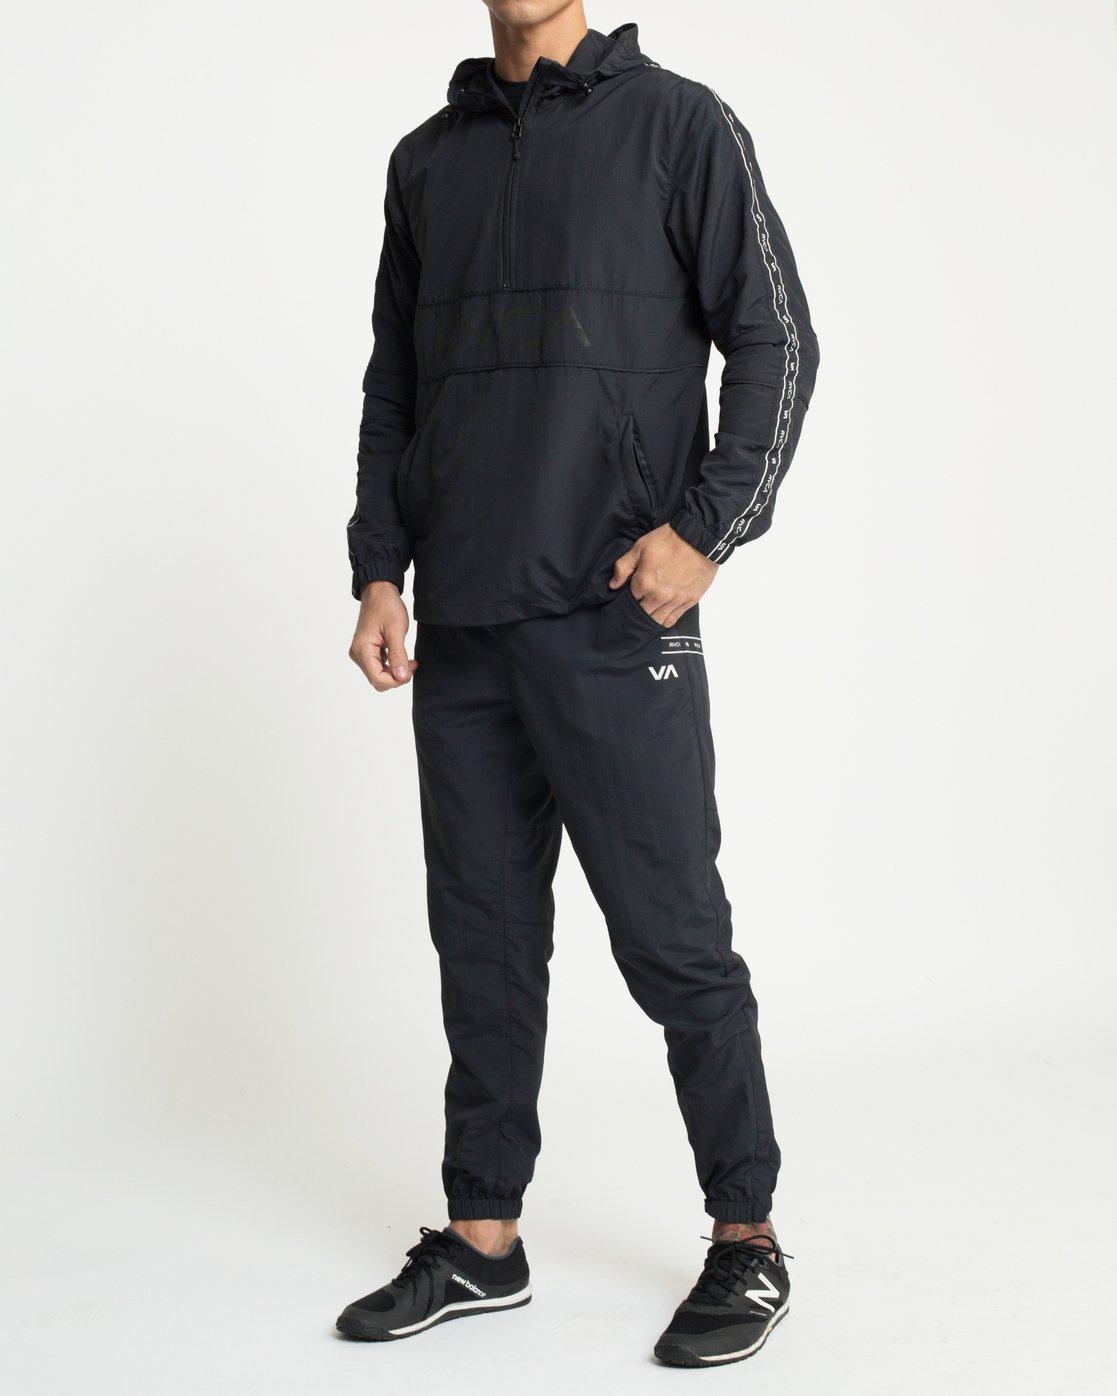 6 Adapter Anorak Jacket Black N4JKMDRVP9 RVCA